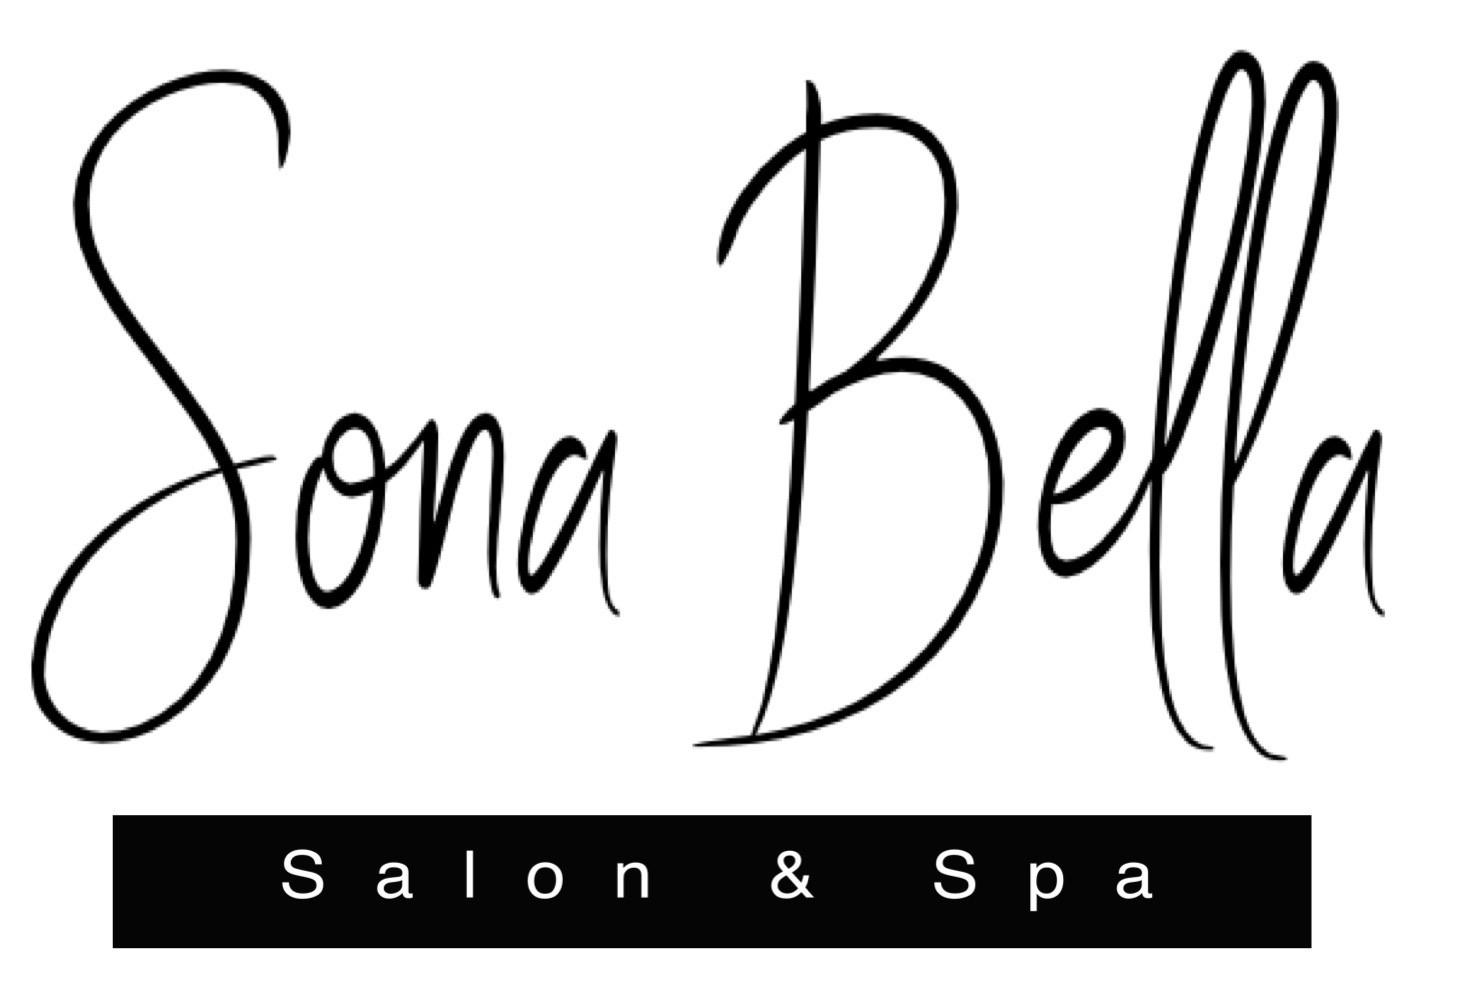 www sonabellasalonandspa com